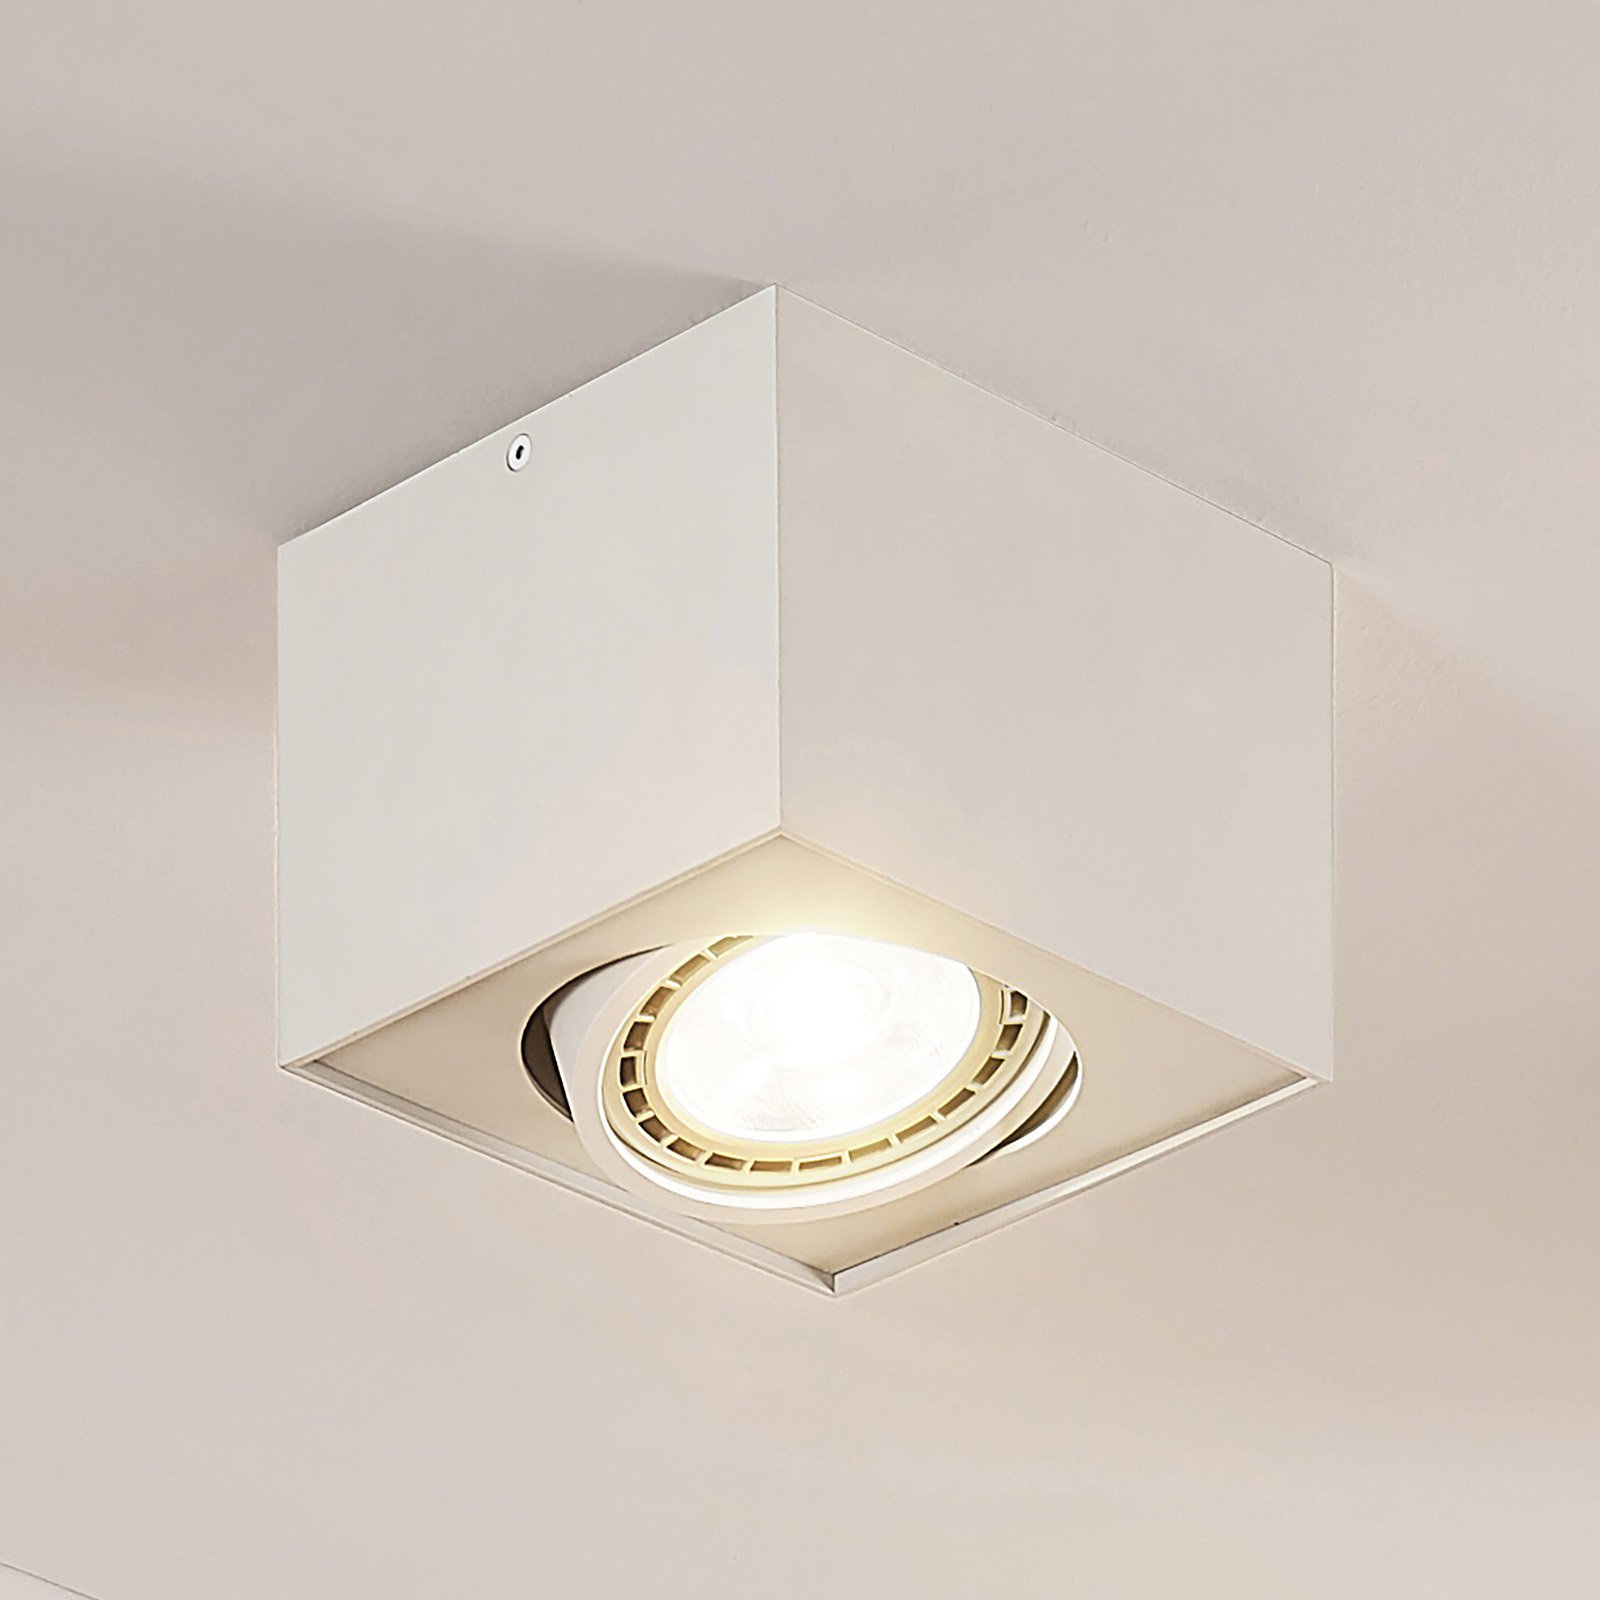 Arccio Dwight LED-takspot i hvit, 1 lyskilde